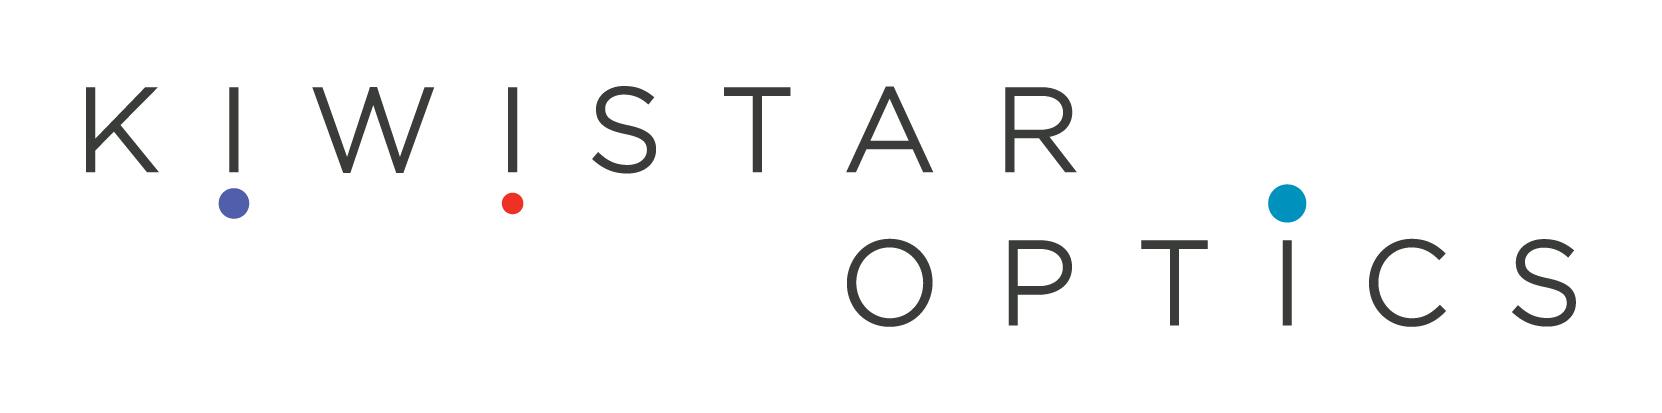 Kiwistar Optics_Logo_RGB_POS